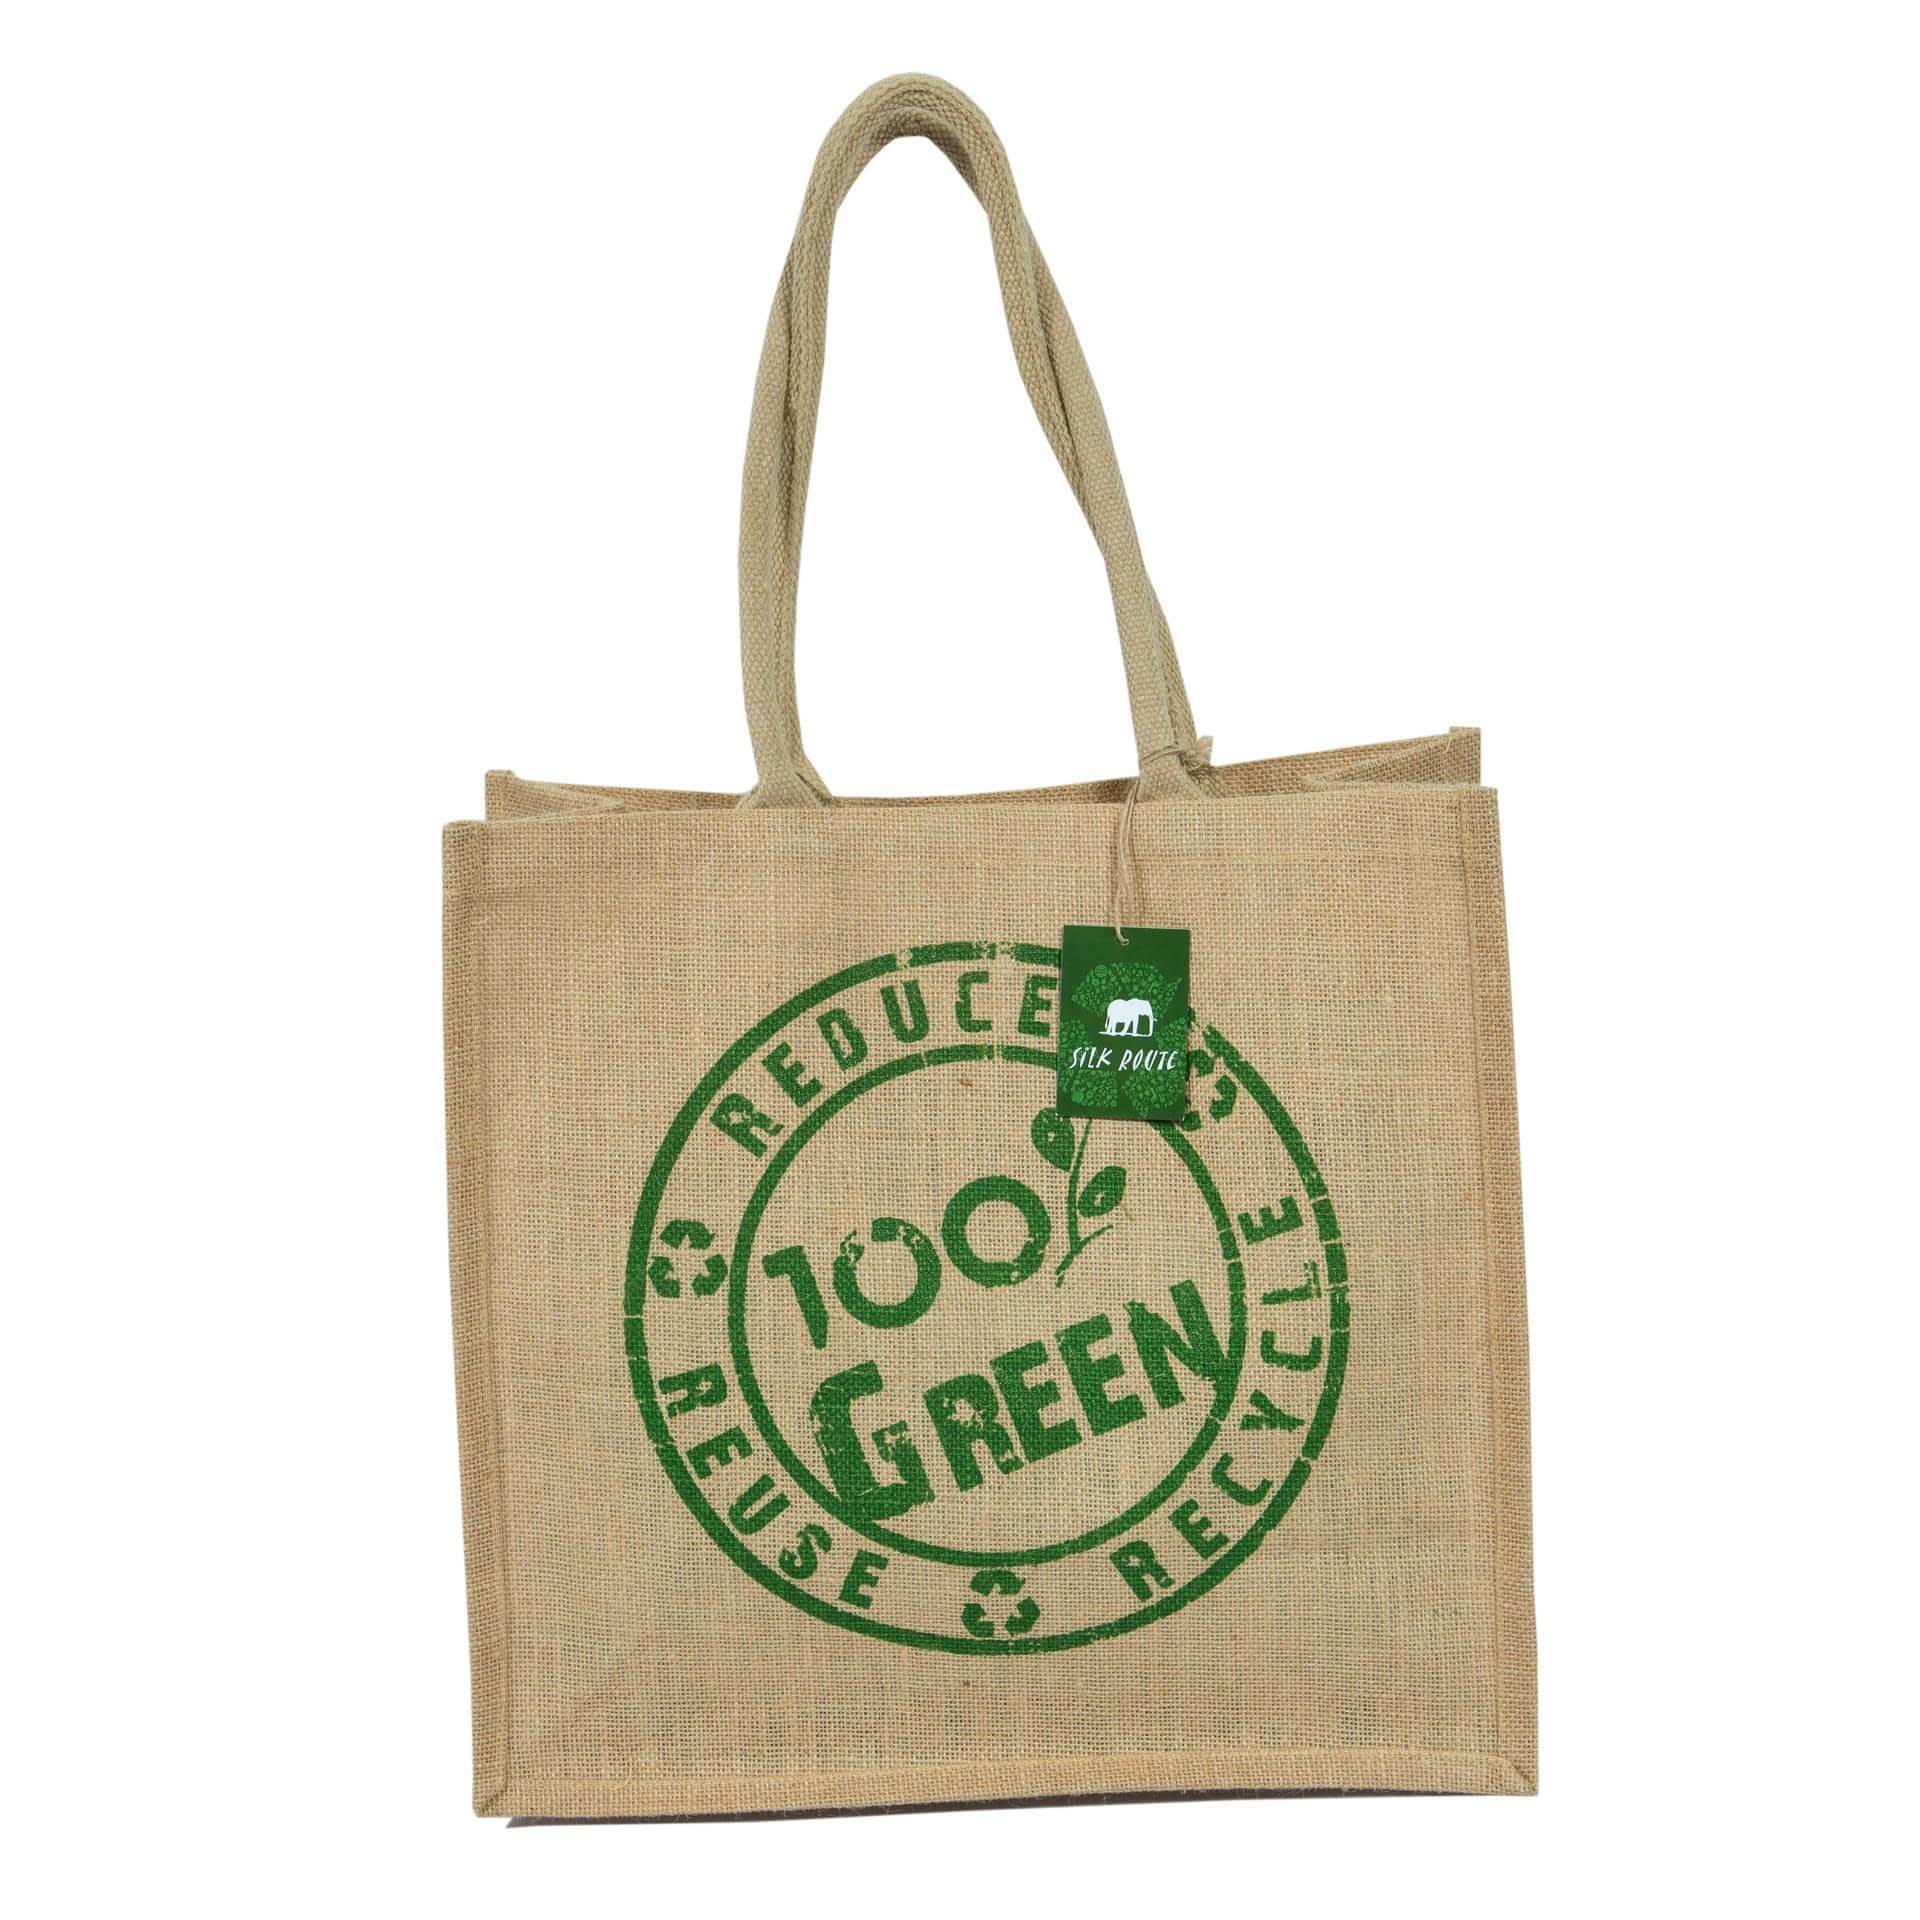 Ткани сумка шоппер - Сумка джутовая шоппер 100% green (ручка 53 см)